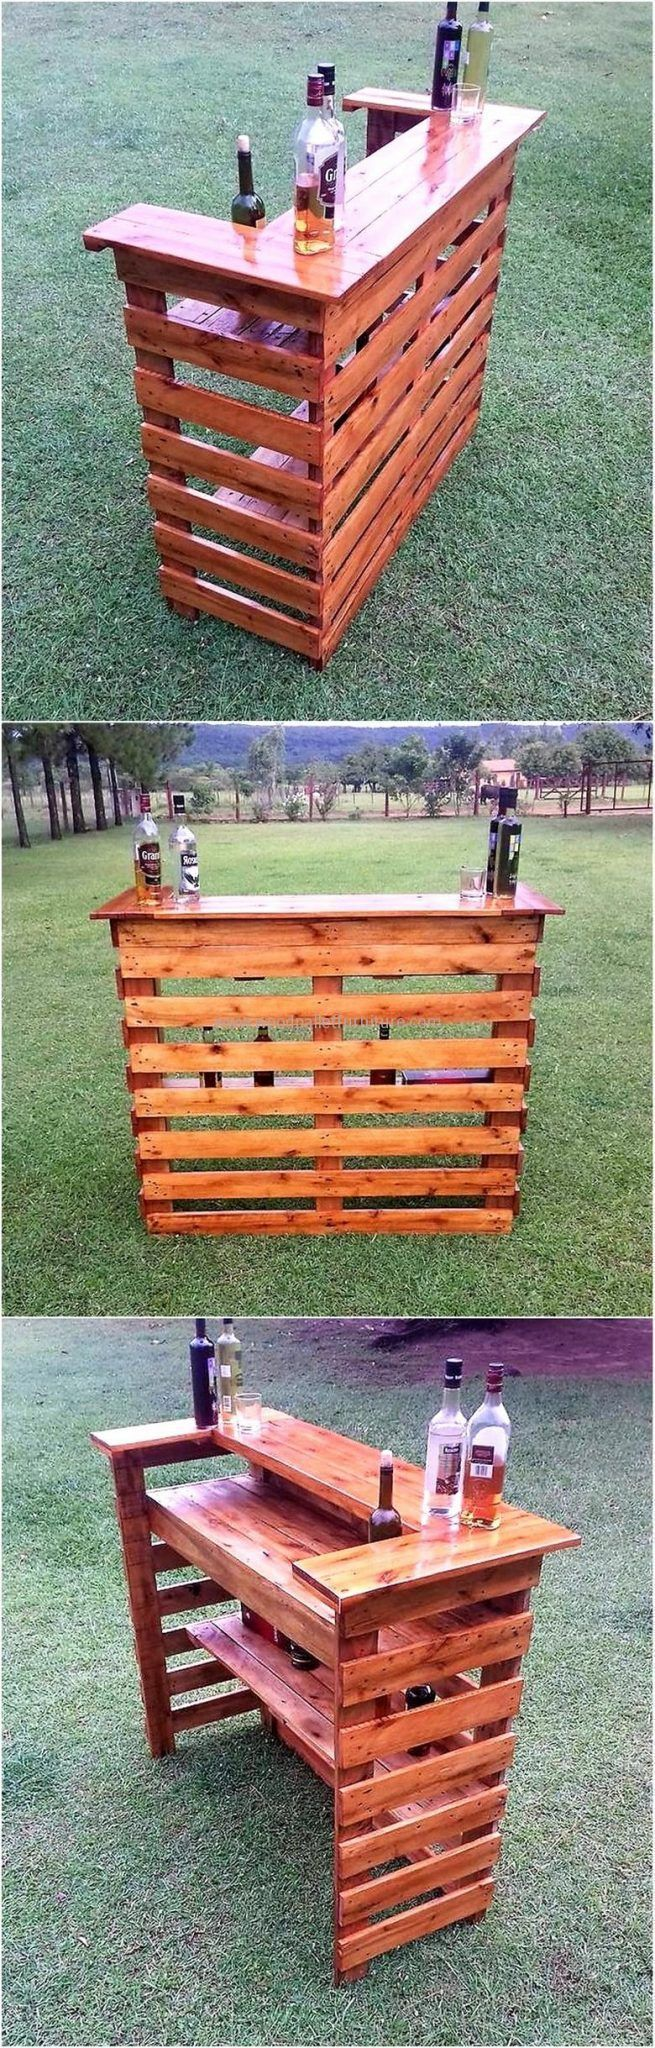 Low Cost DIY Pallet Wood Creations Walls